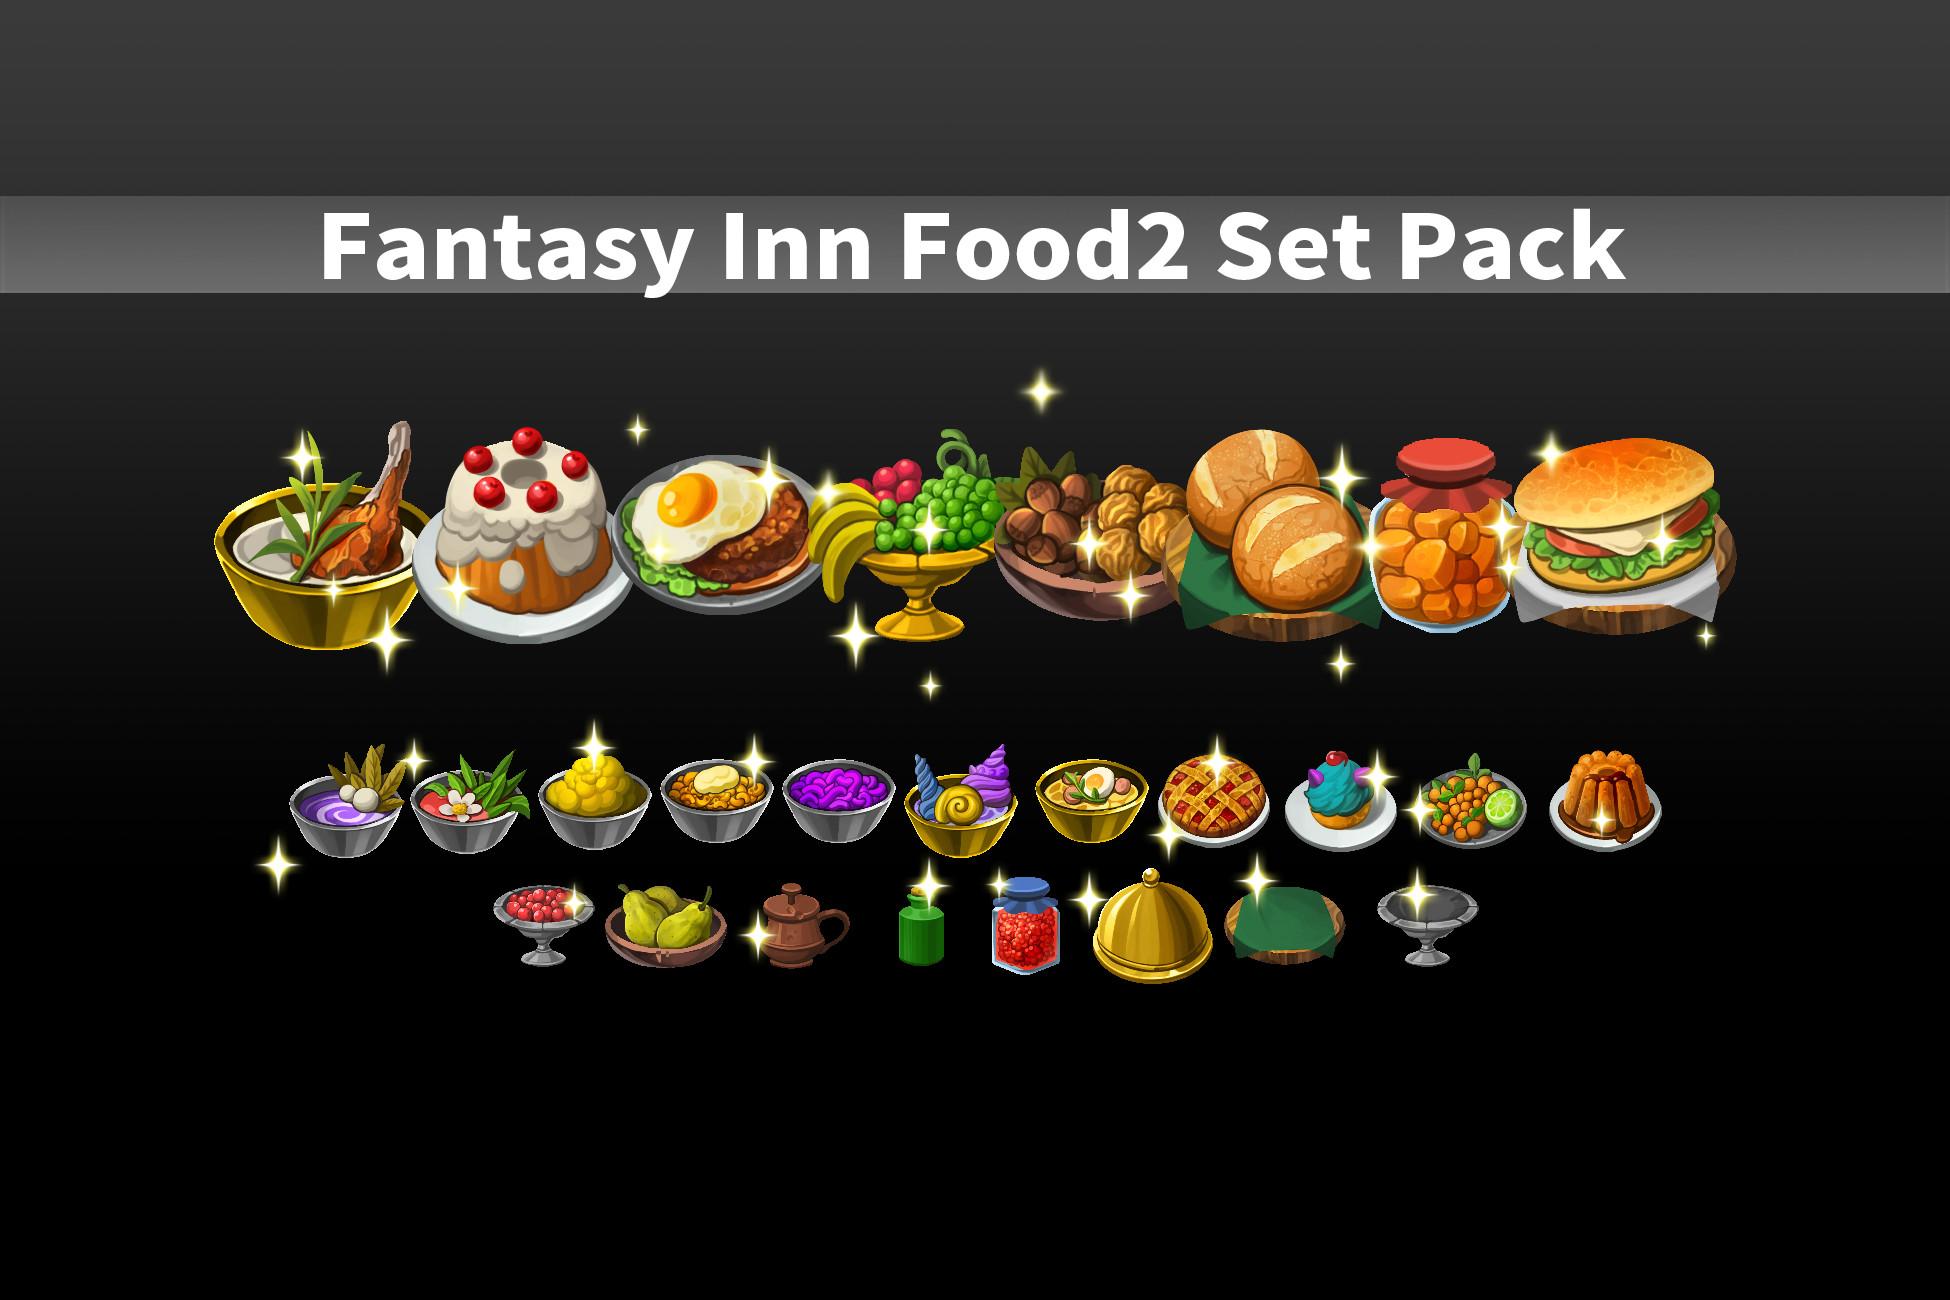 Fantasy Inn Food2 Set Pack